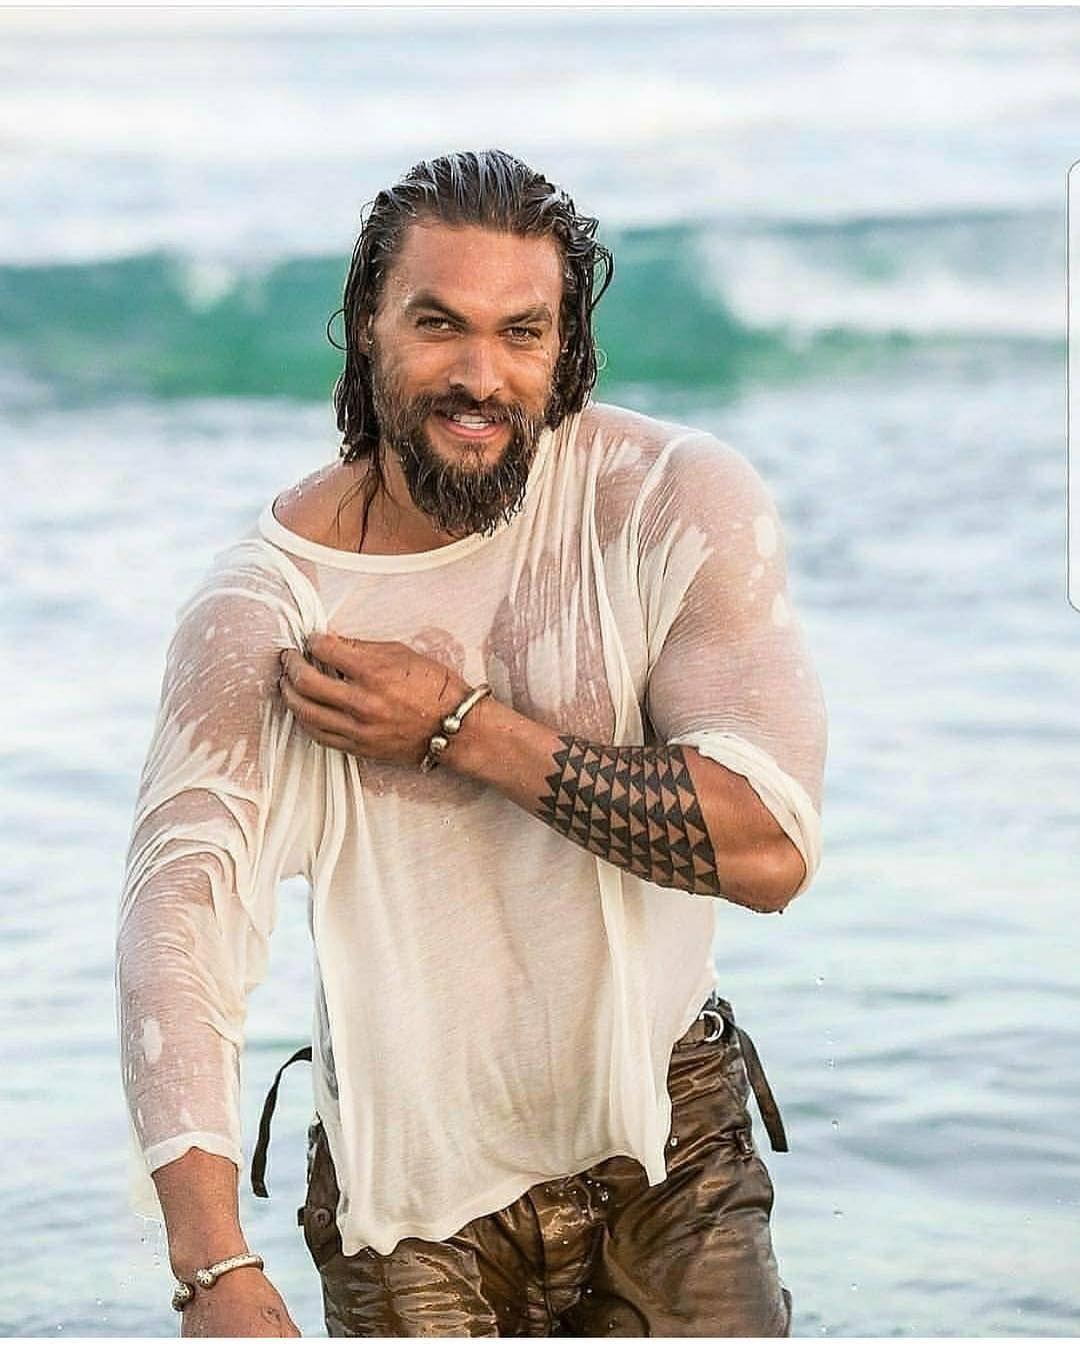 "fa6550ebf247aa Brave & Bearded™ on Instagram: ""Jason Momoa AKA #aquaman @prideofgypsies -  Birth Name: Joseph Jason Namakaeha Momoa Born: August 1, 1979 in Honolulu,  Hawaii ..."